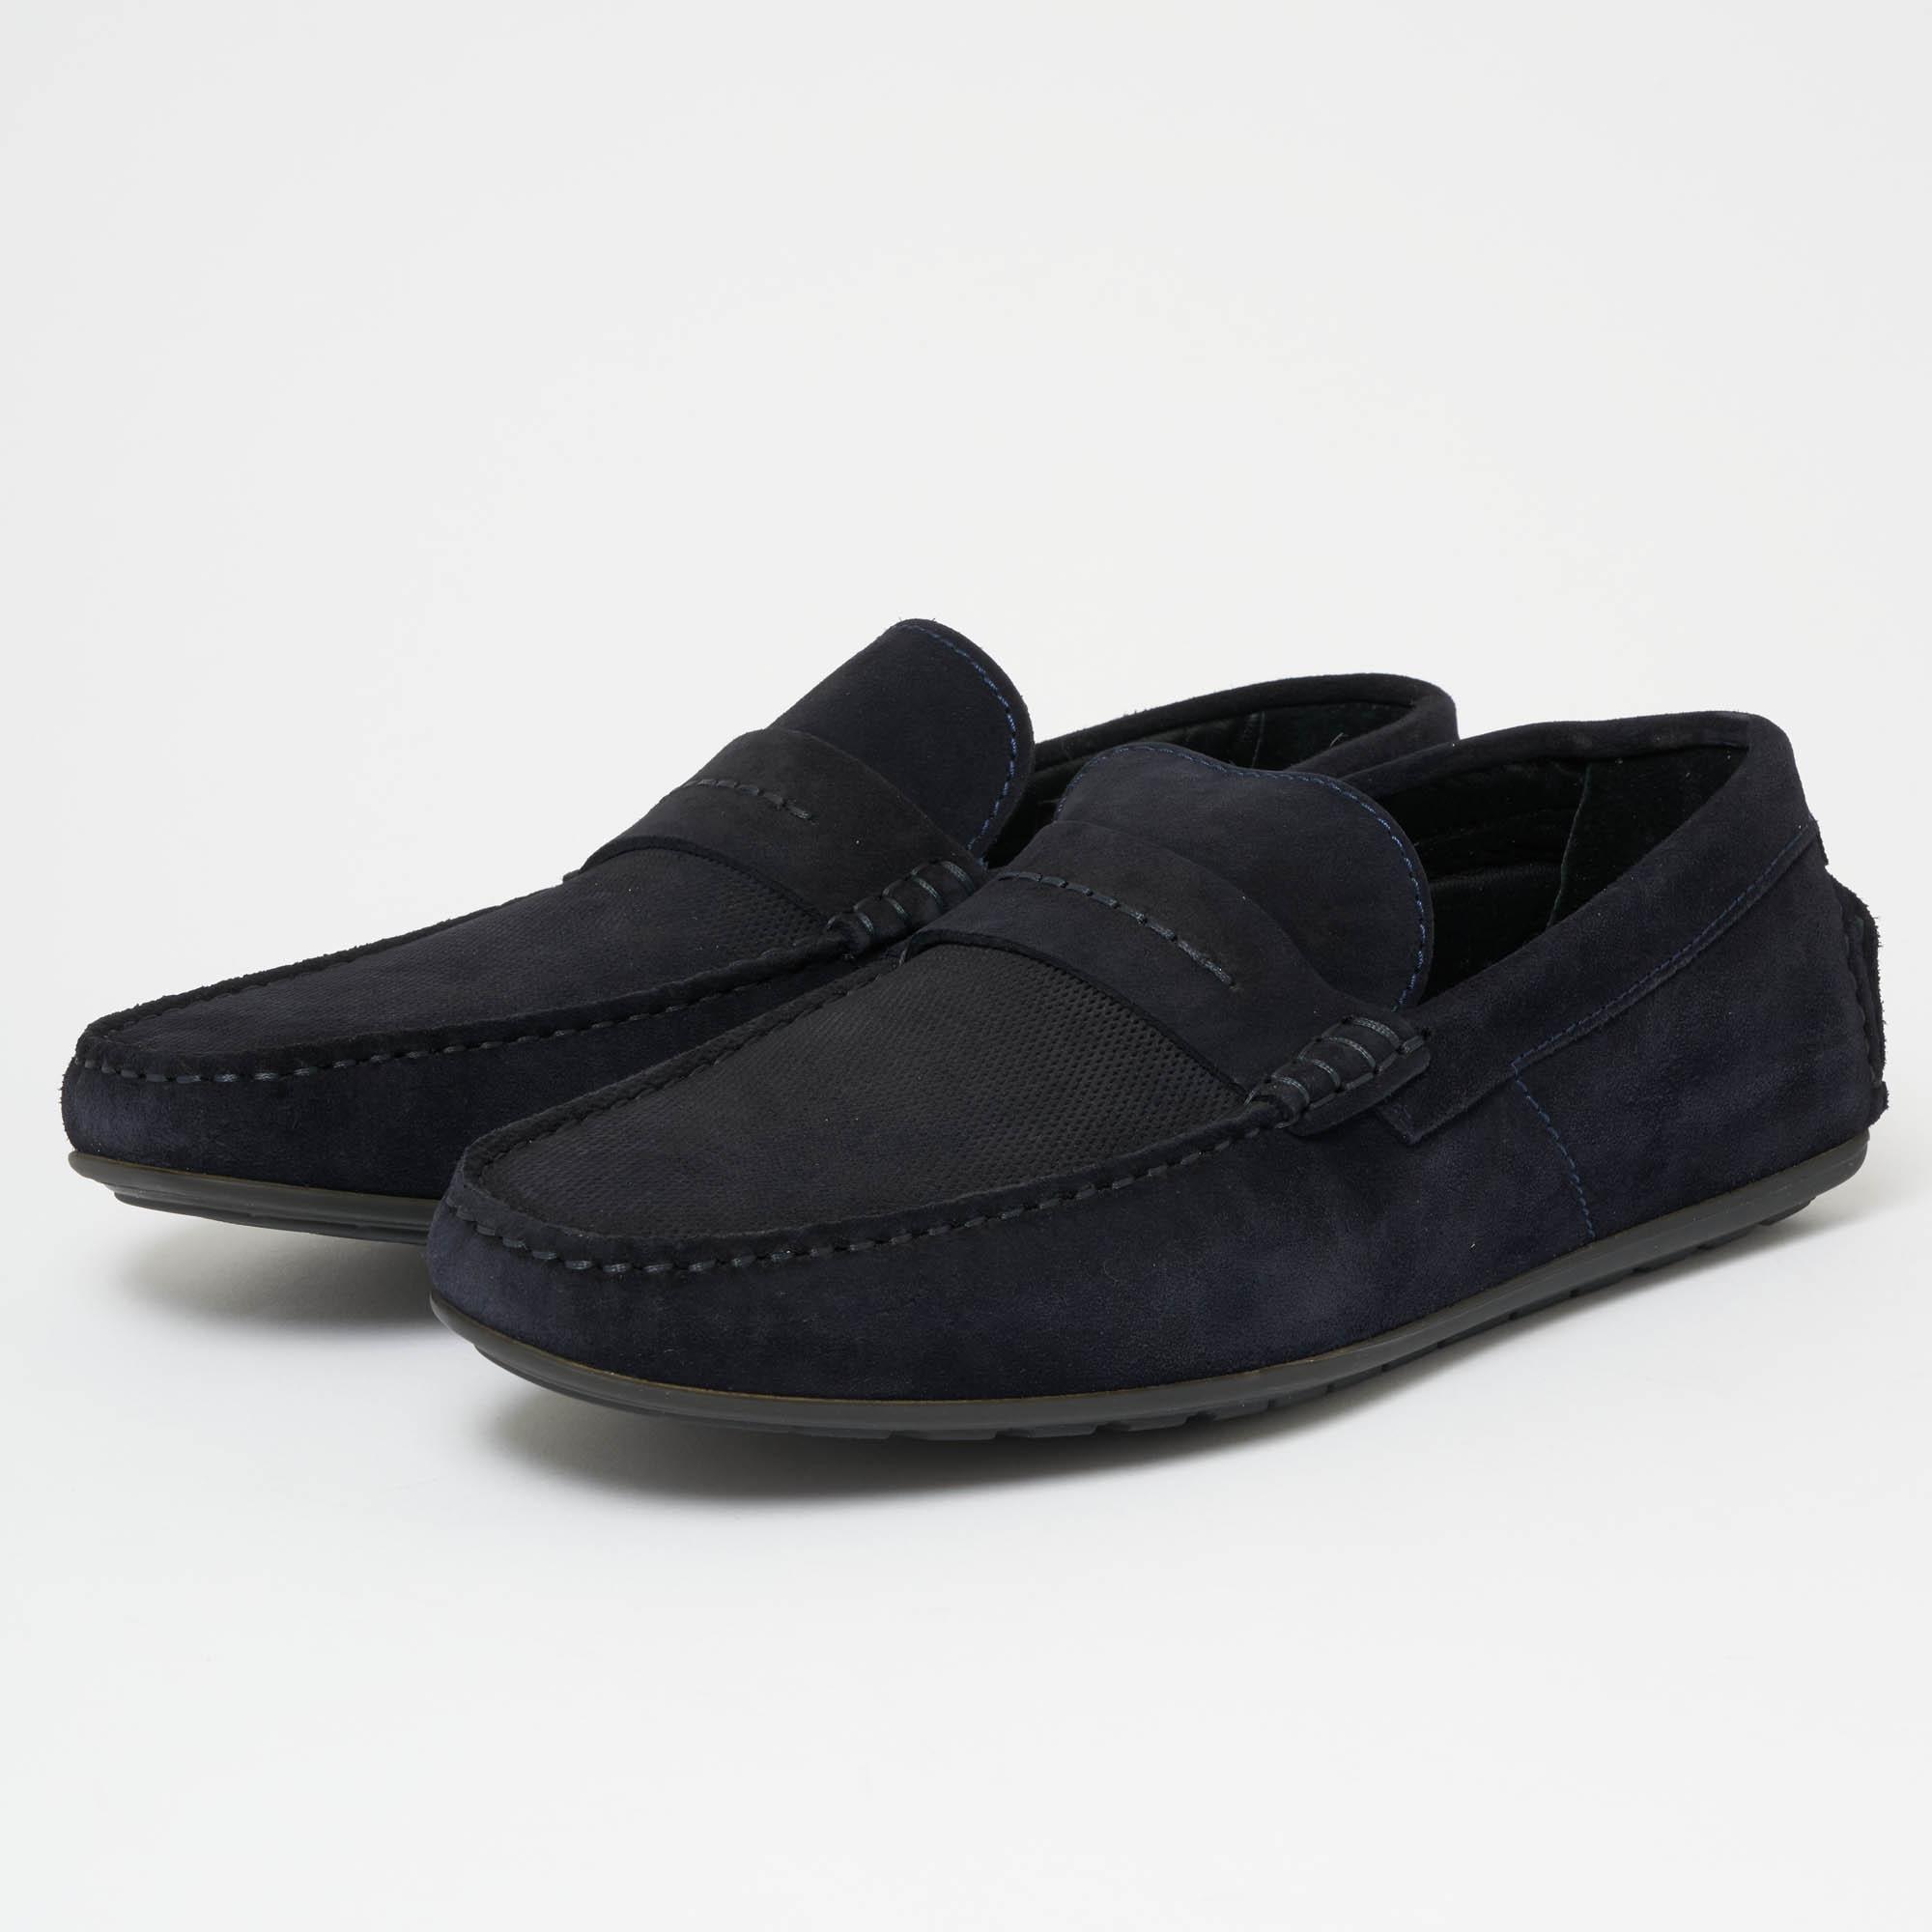 9ea005446f4 HUGO Hugo Boss Dandy Moccasin Dark Blue Shoe in Blue for Men - Lyst